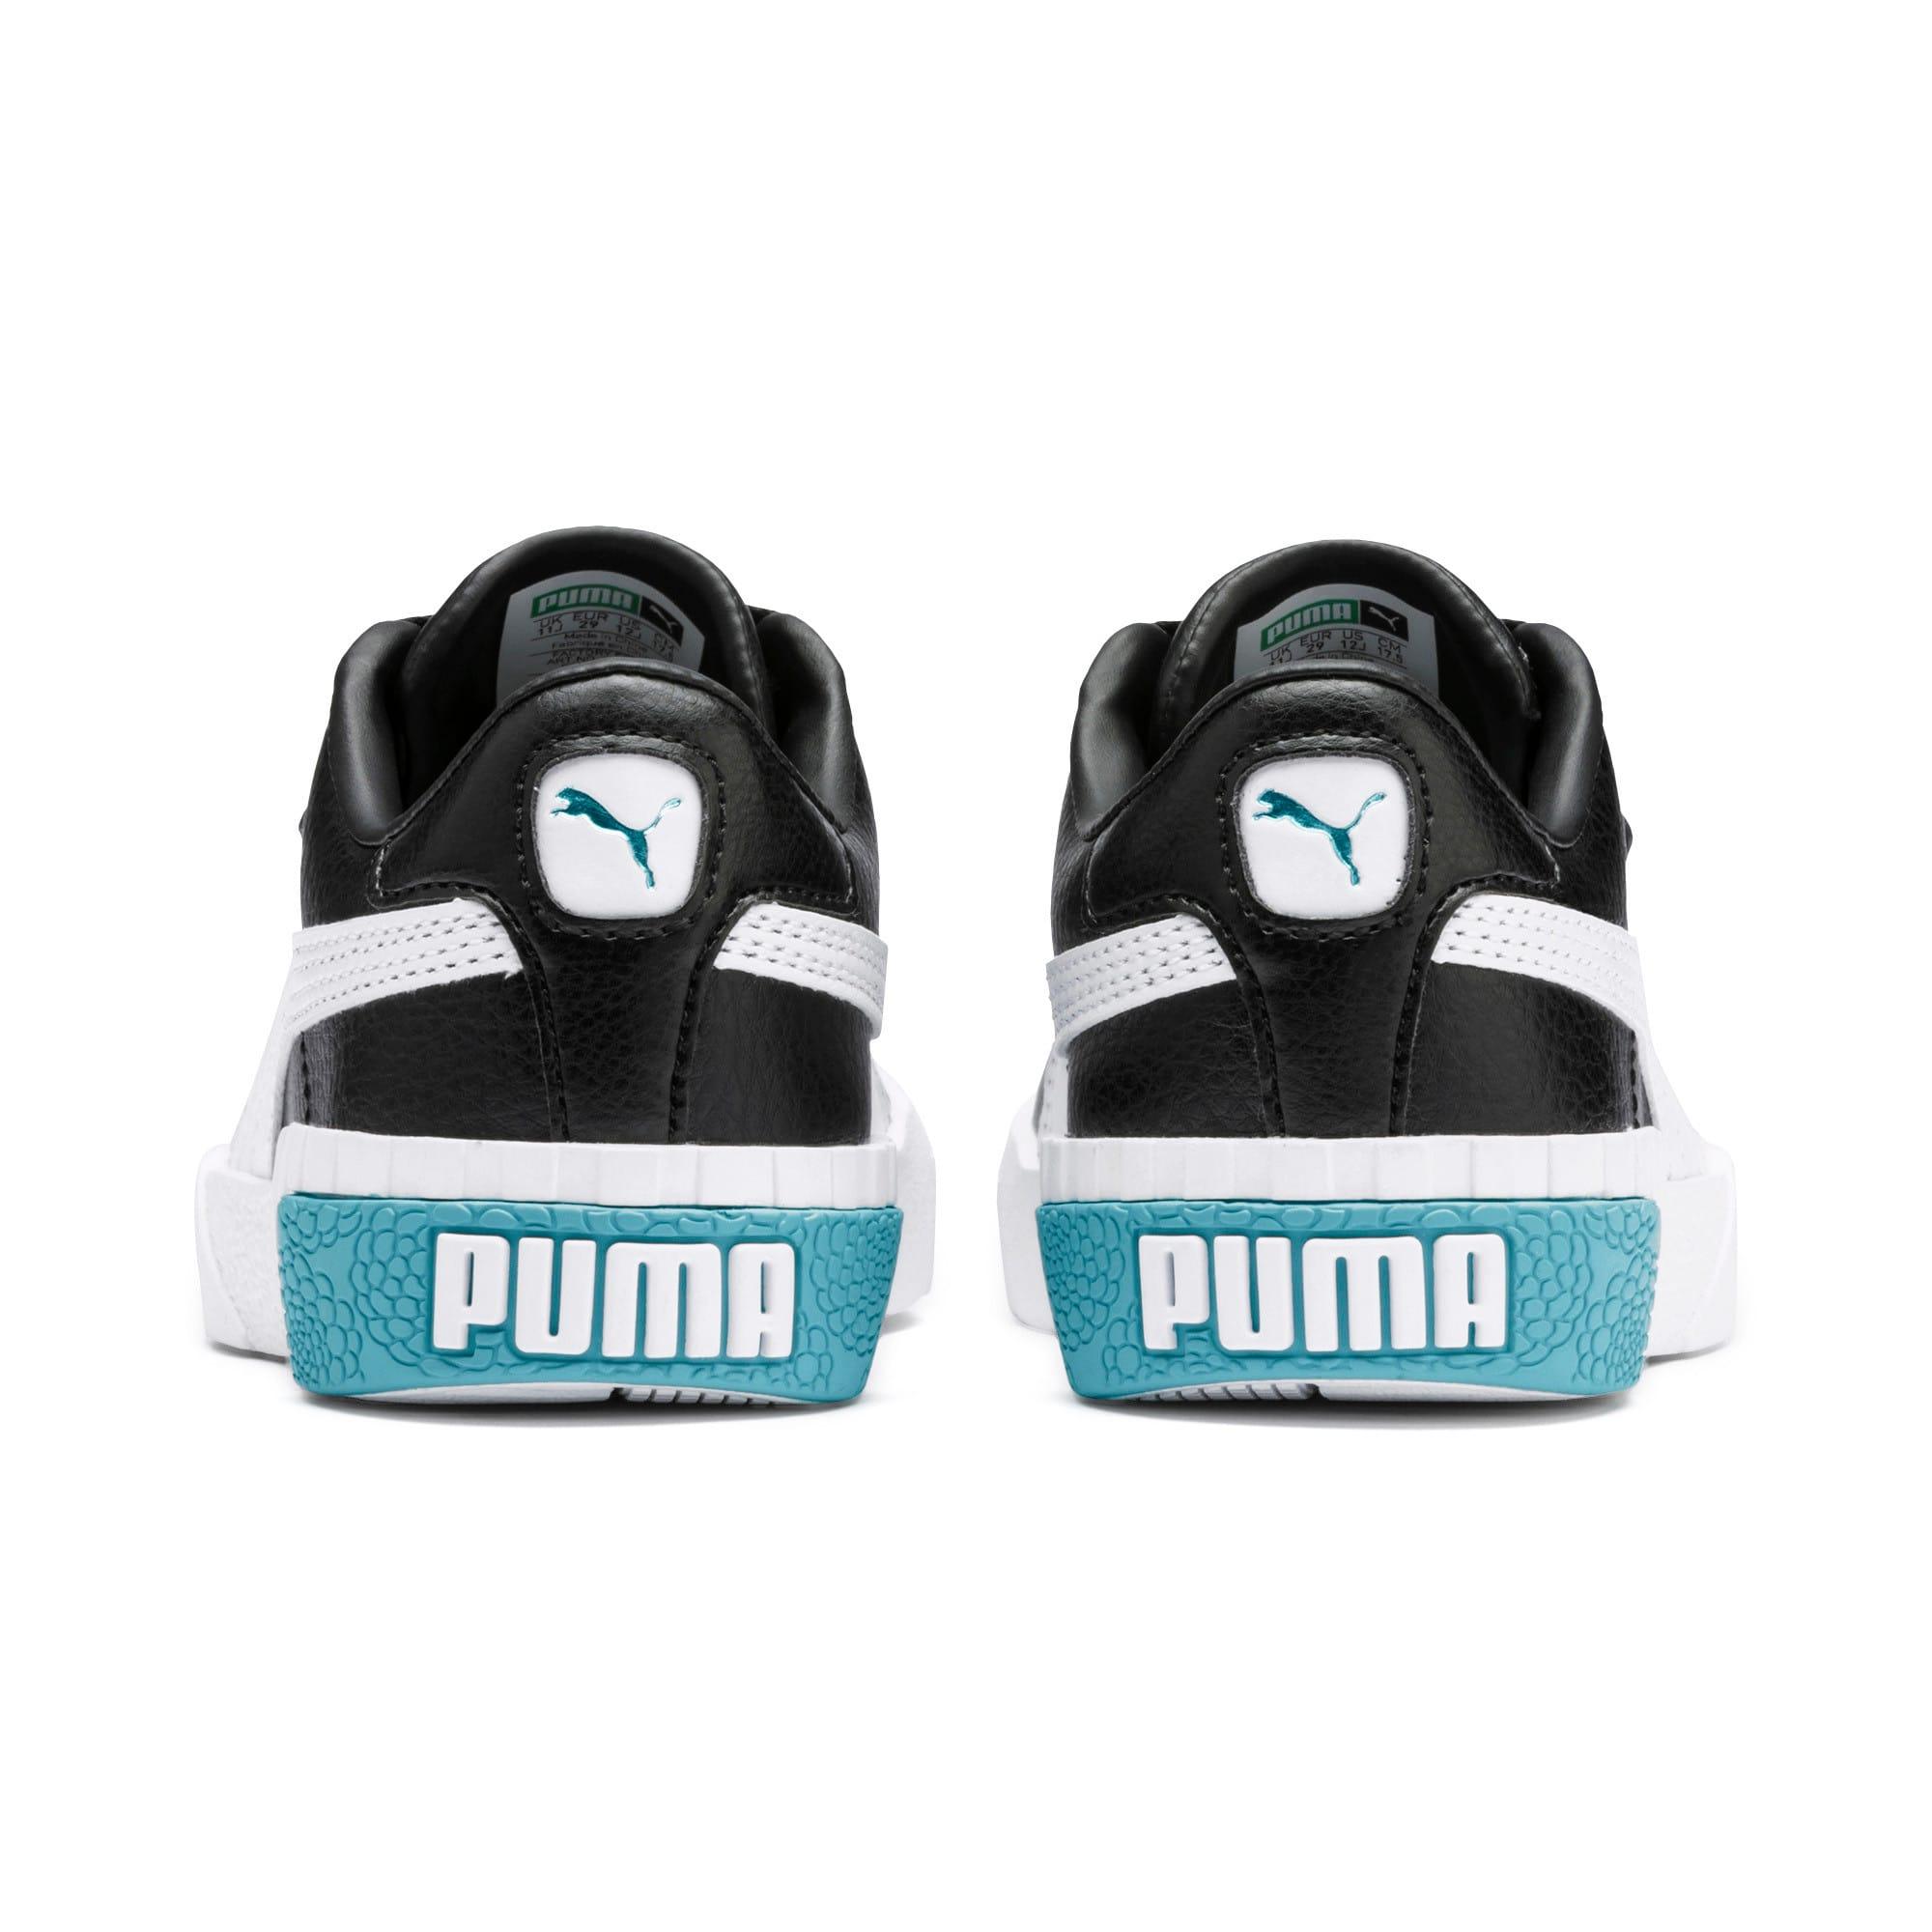 Thumbnail 3 of Cali Girls' Trainers, Puma Black-Milky Blue, medium